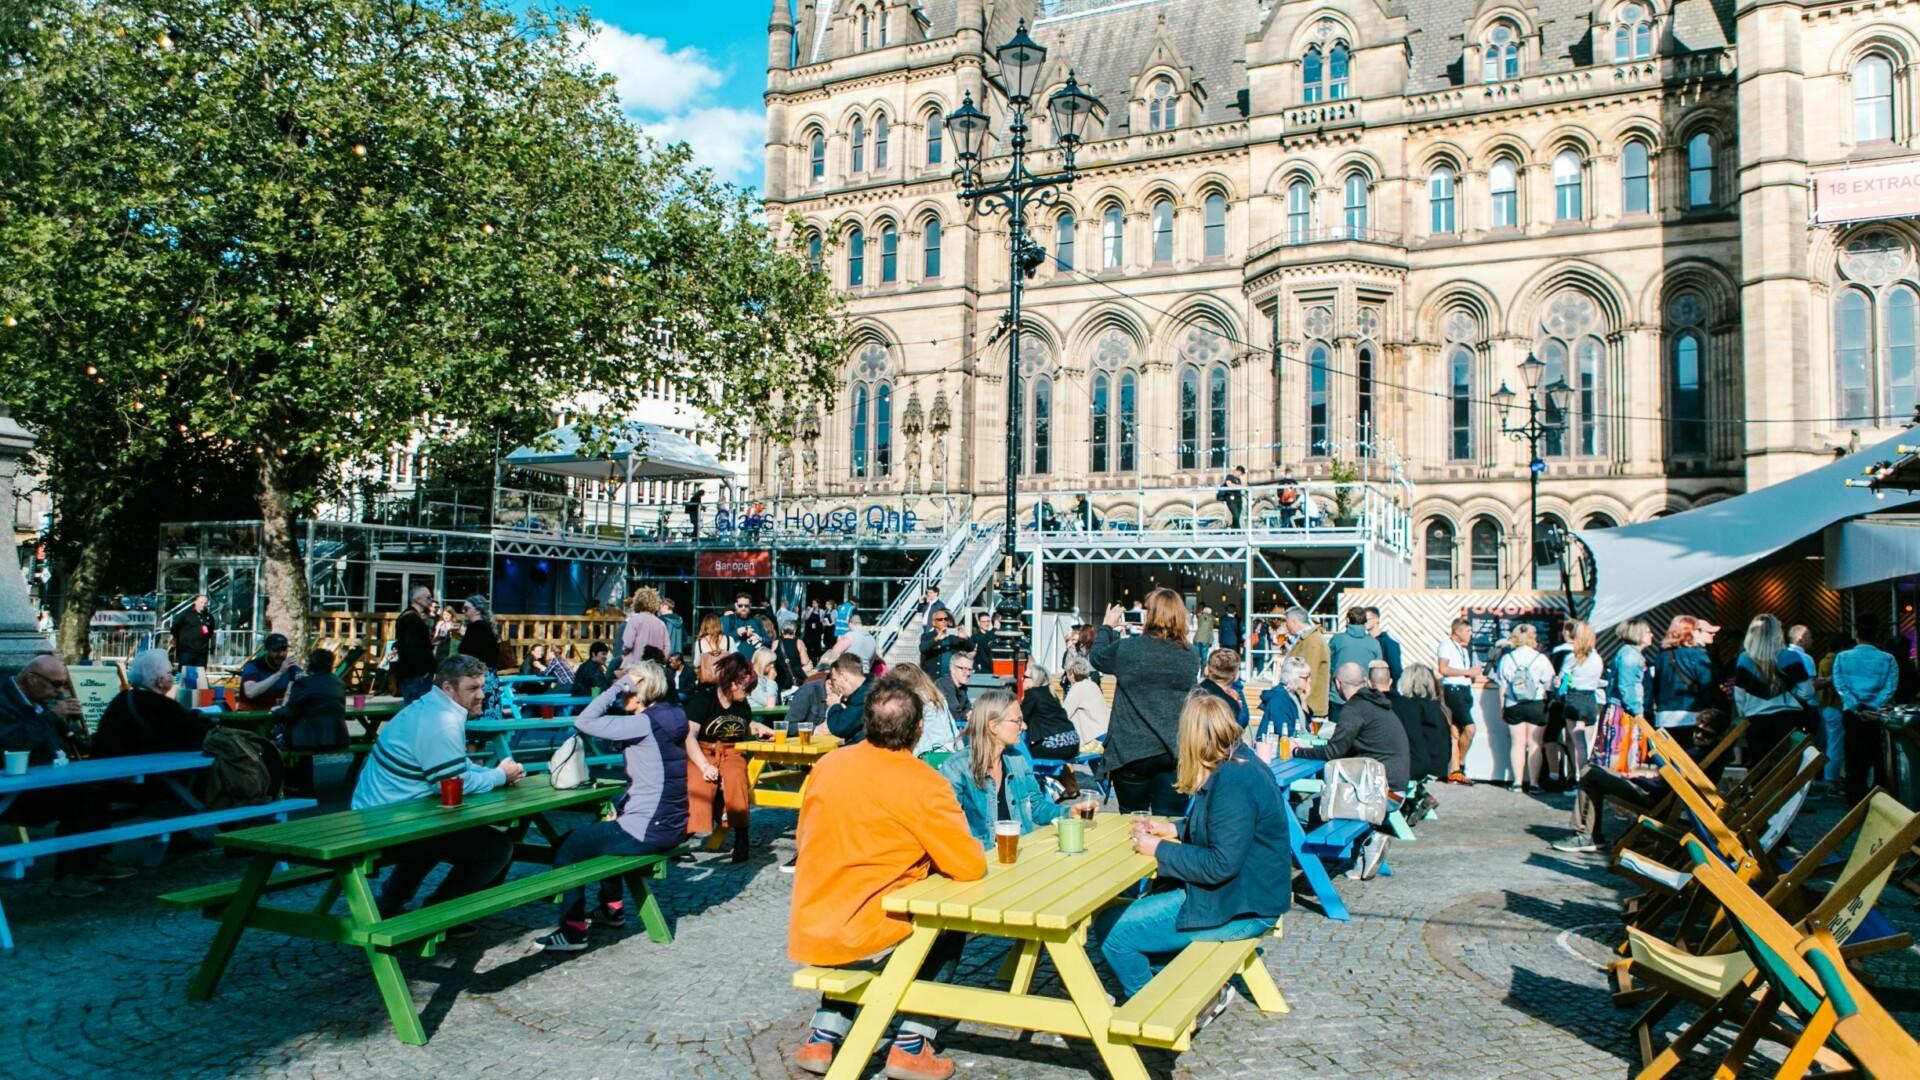 Festival Square at Manchester International Festival 2019 credit Louis Reynolds